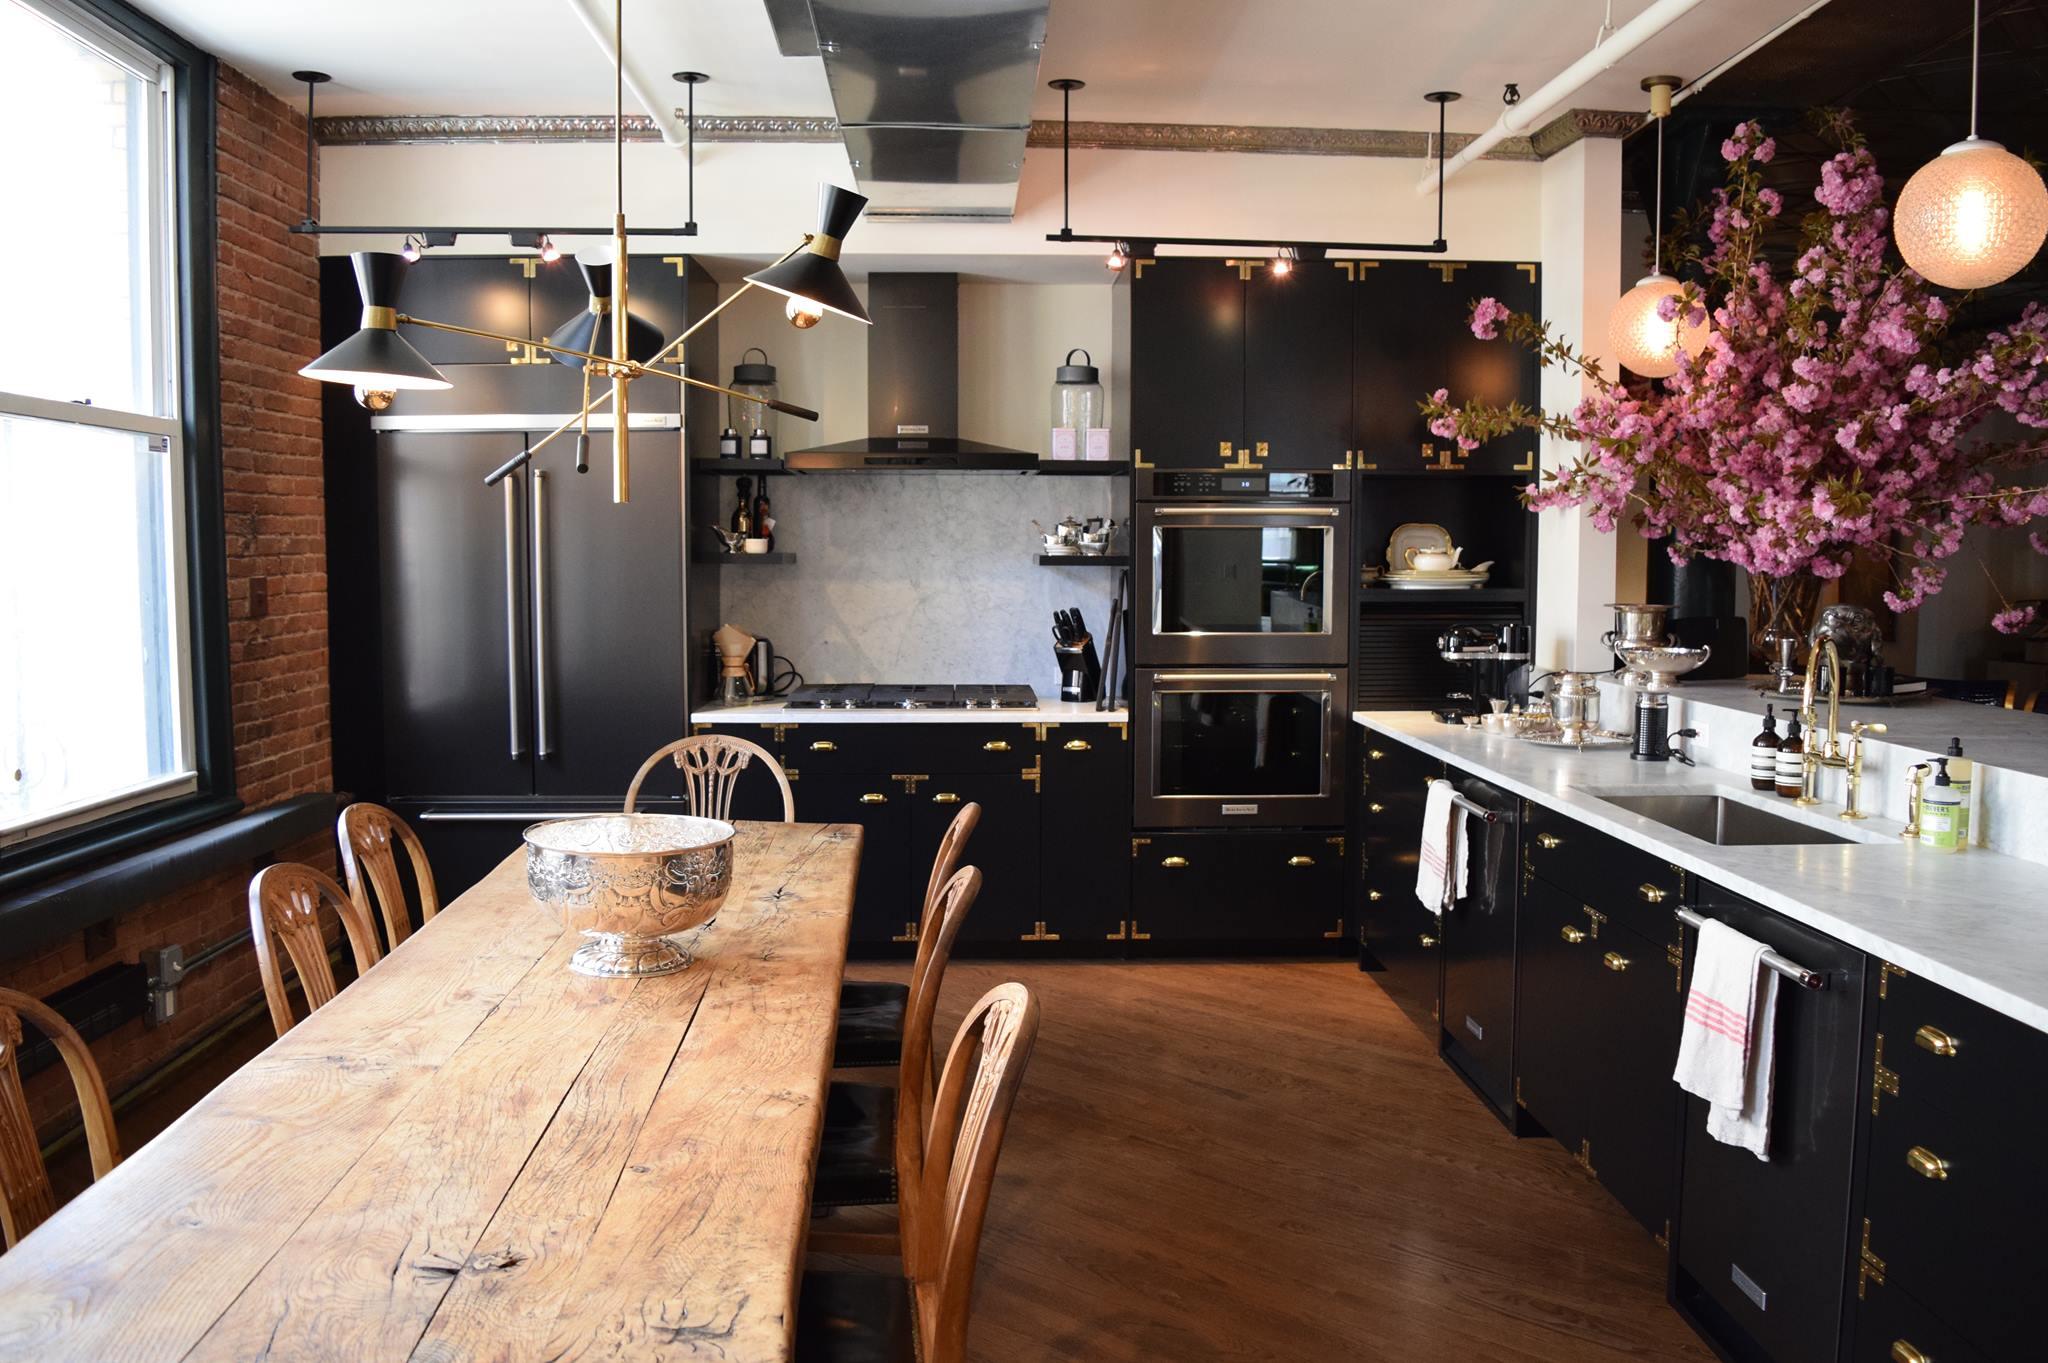 KitchenAid Black Stainless Steel Appliances |Kitchen ...